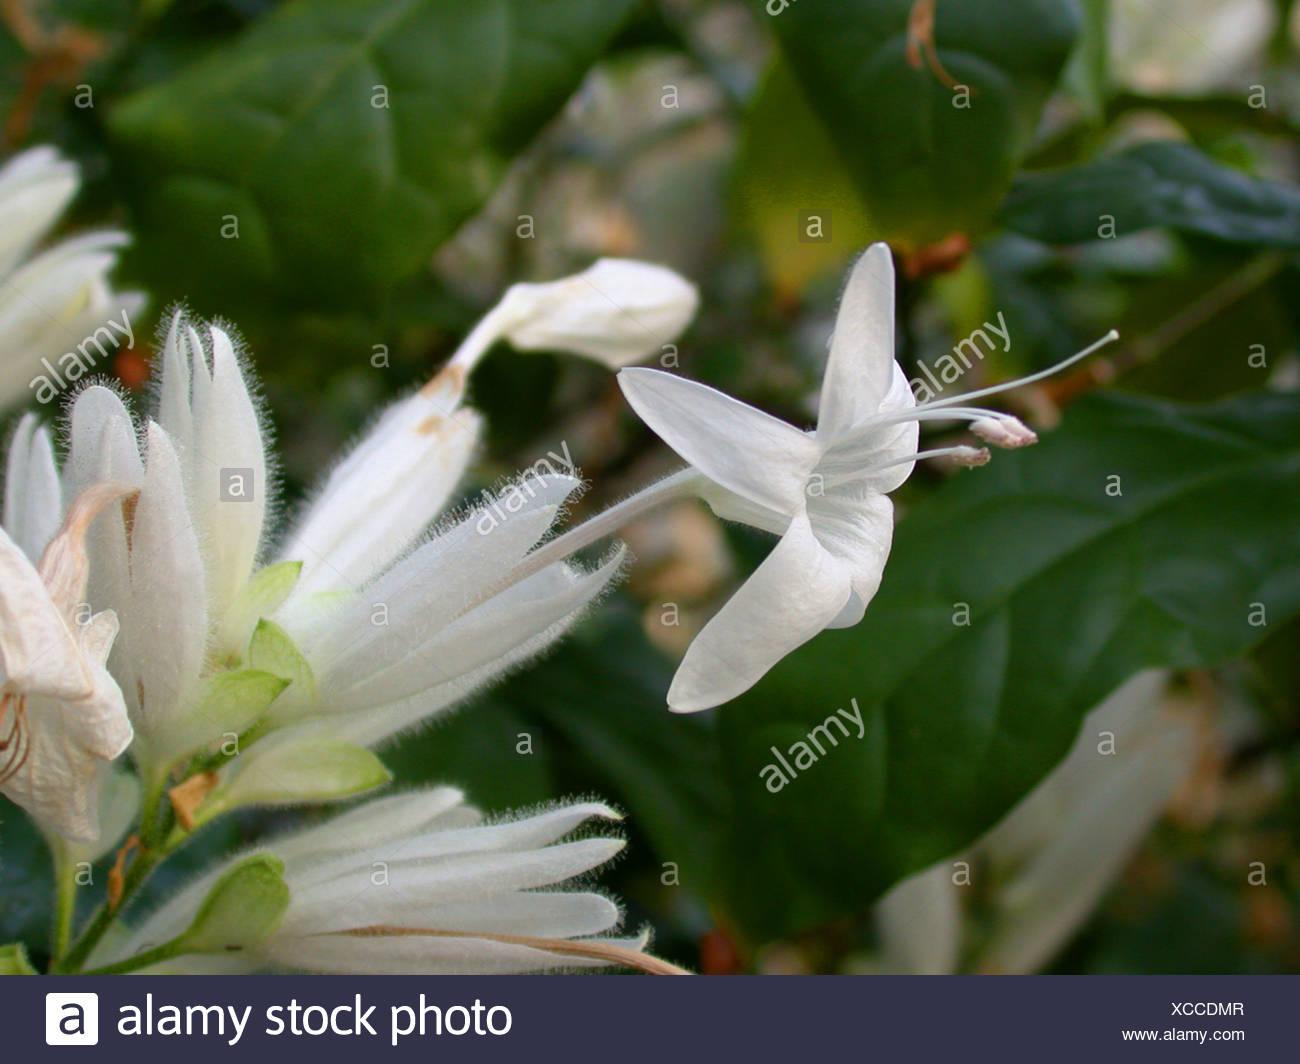 Whitfieldia (Whitfieldia elongata), blooming Stock Photo